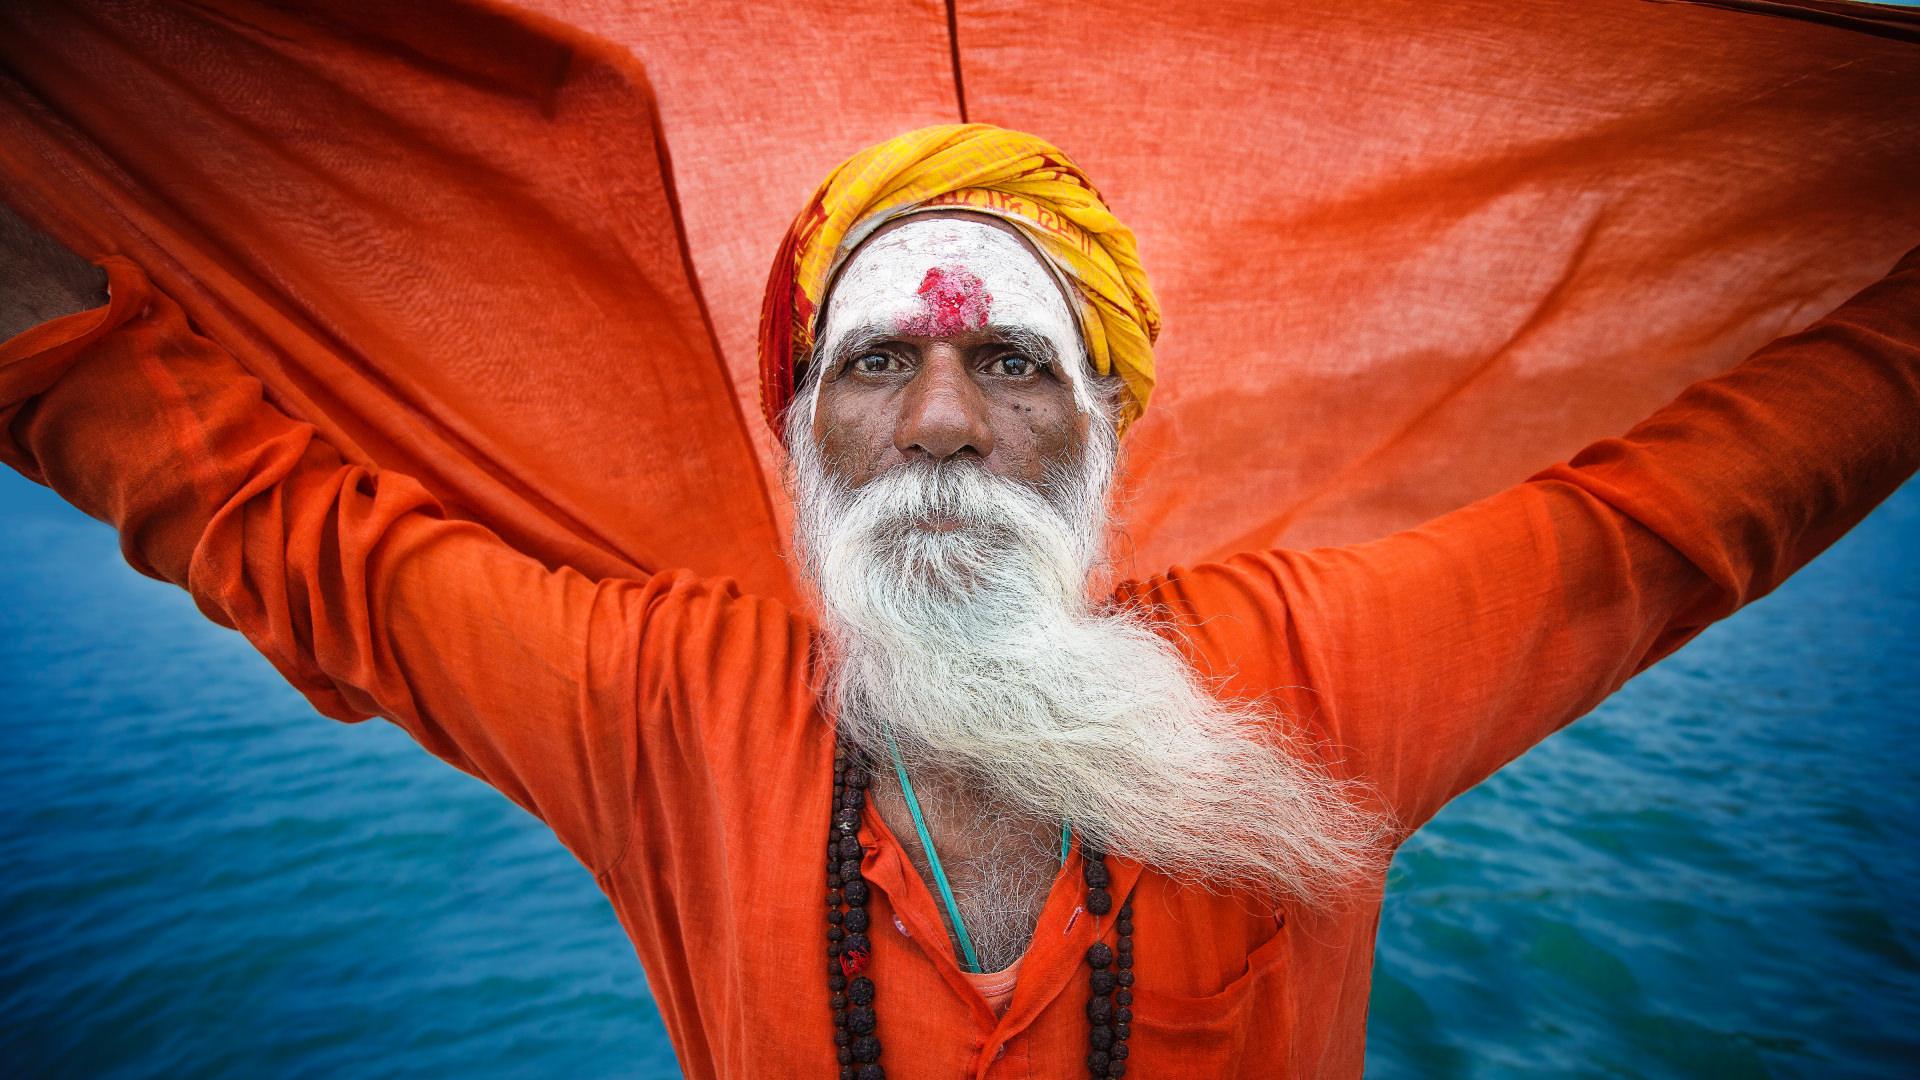 Hindistan'ın Gizemli Sadhuları